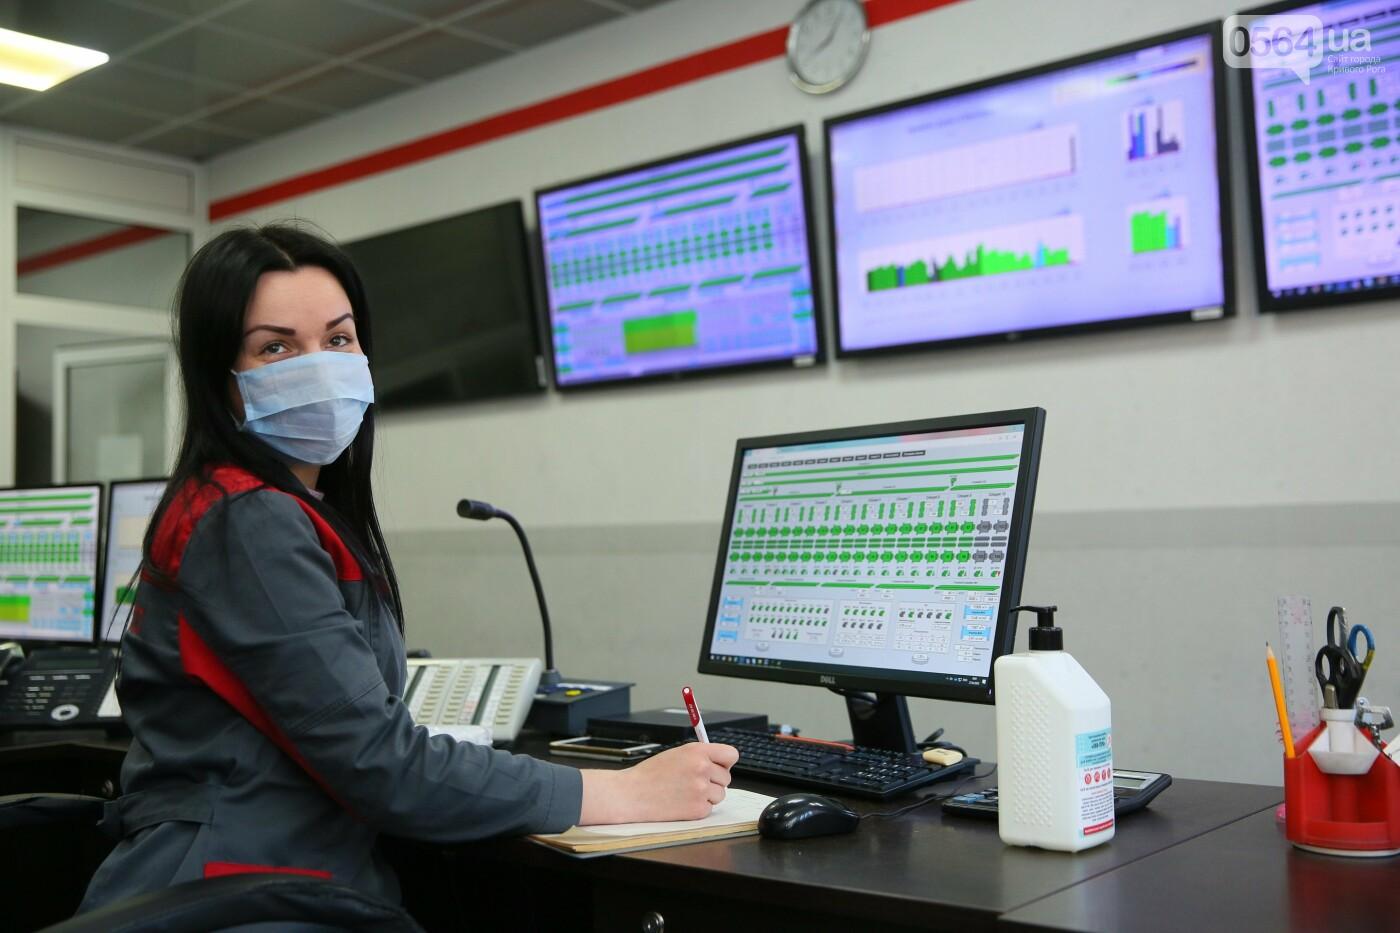 Как Метинвест помогает Кривому Рогу во время пандемии, фото-2